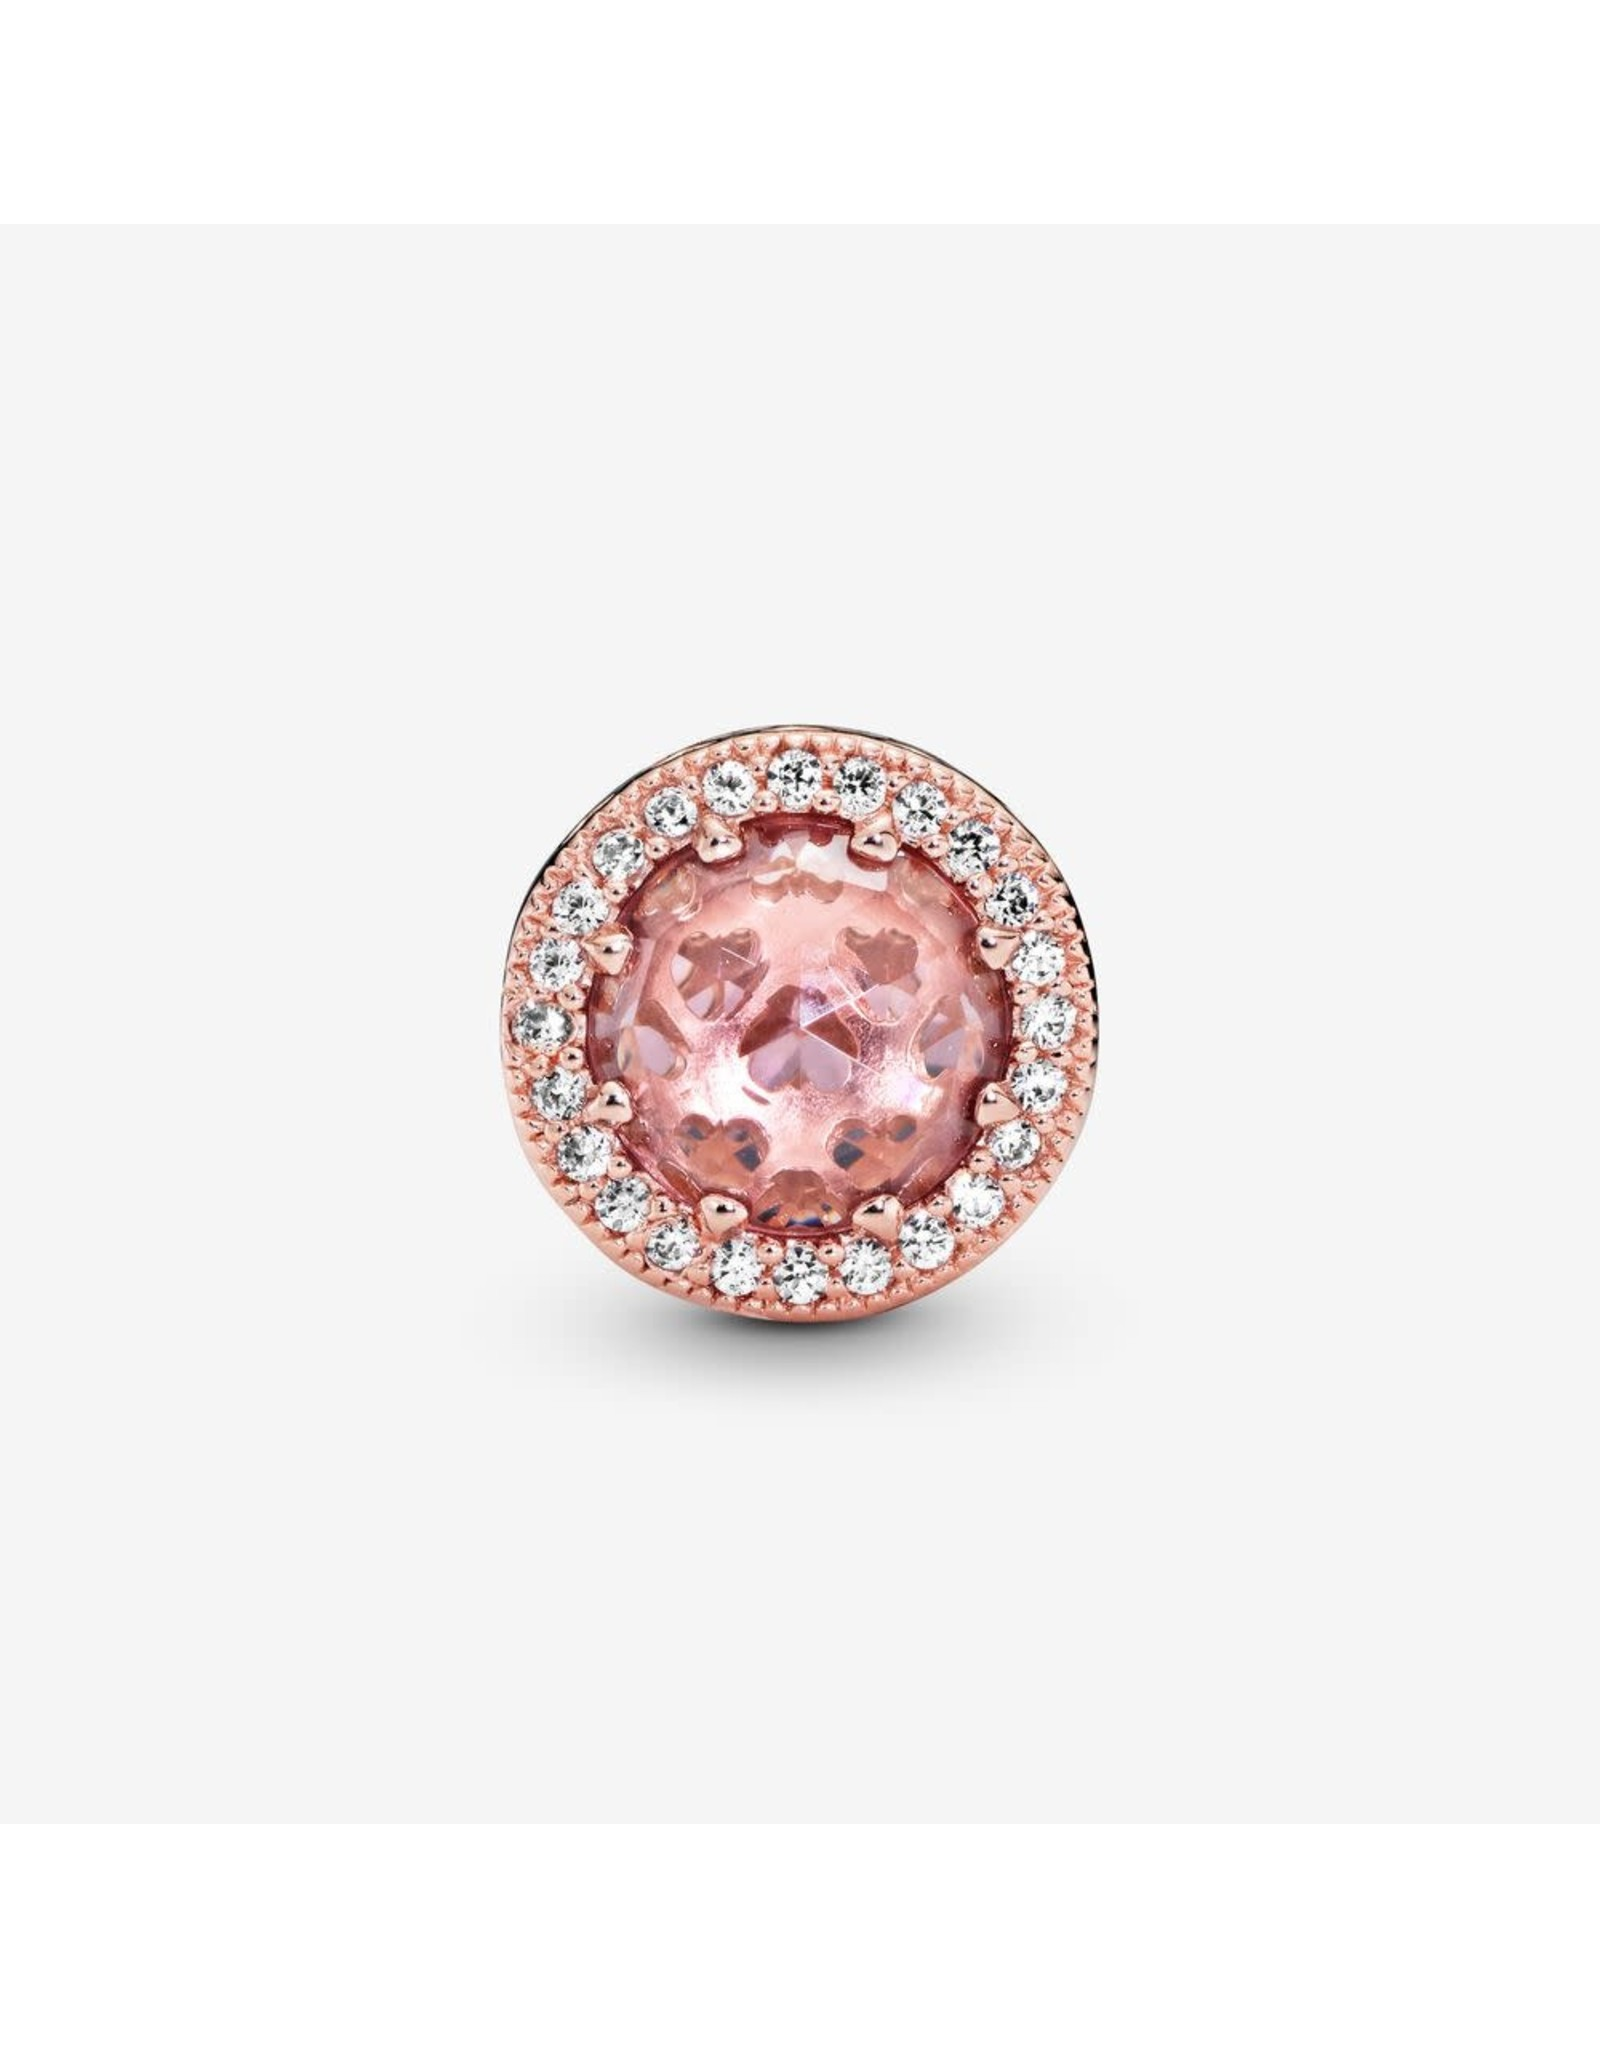 Pandora Pandora Charm Rose Gold Blush Pink Crystals Clear CZ